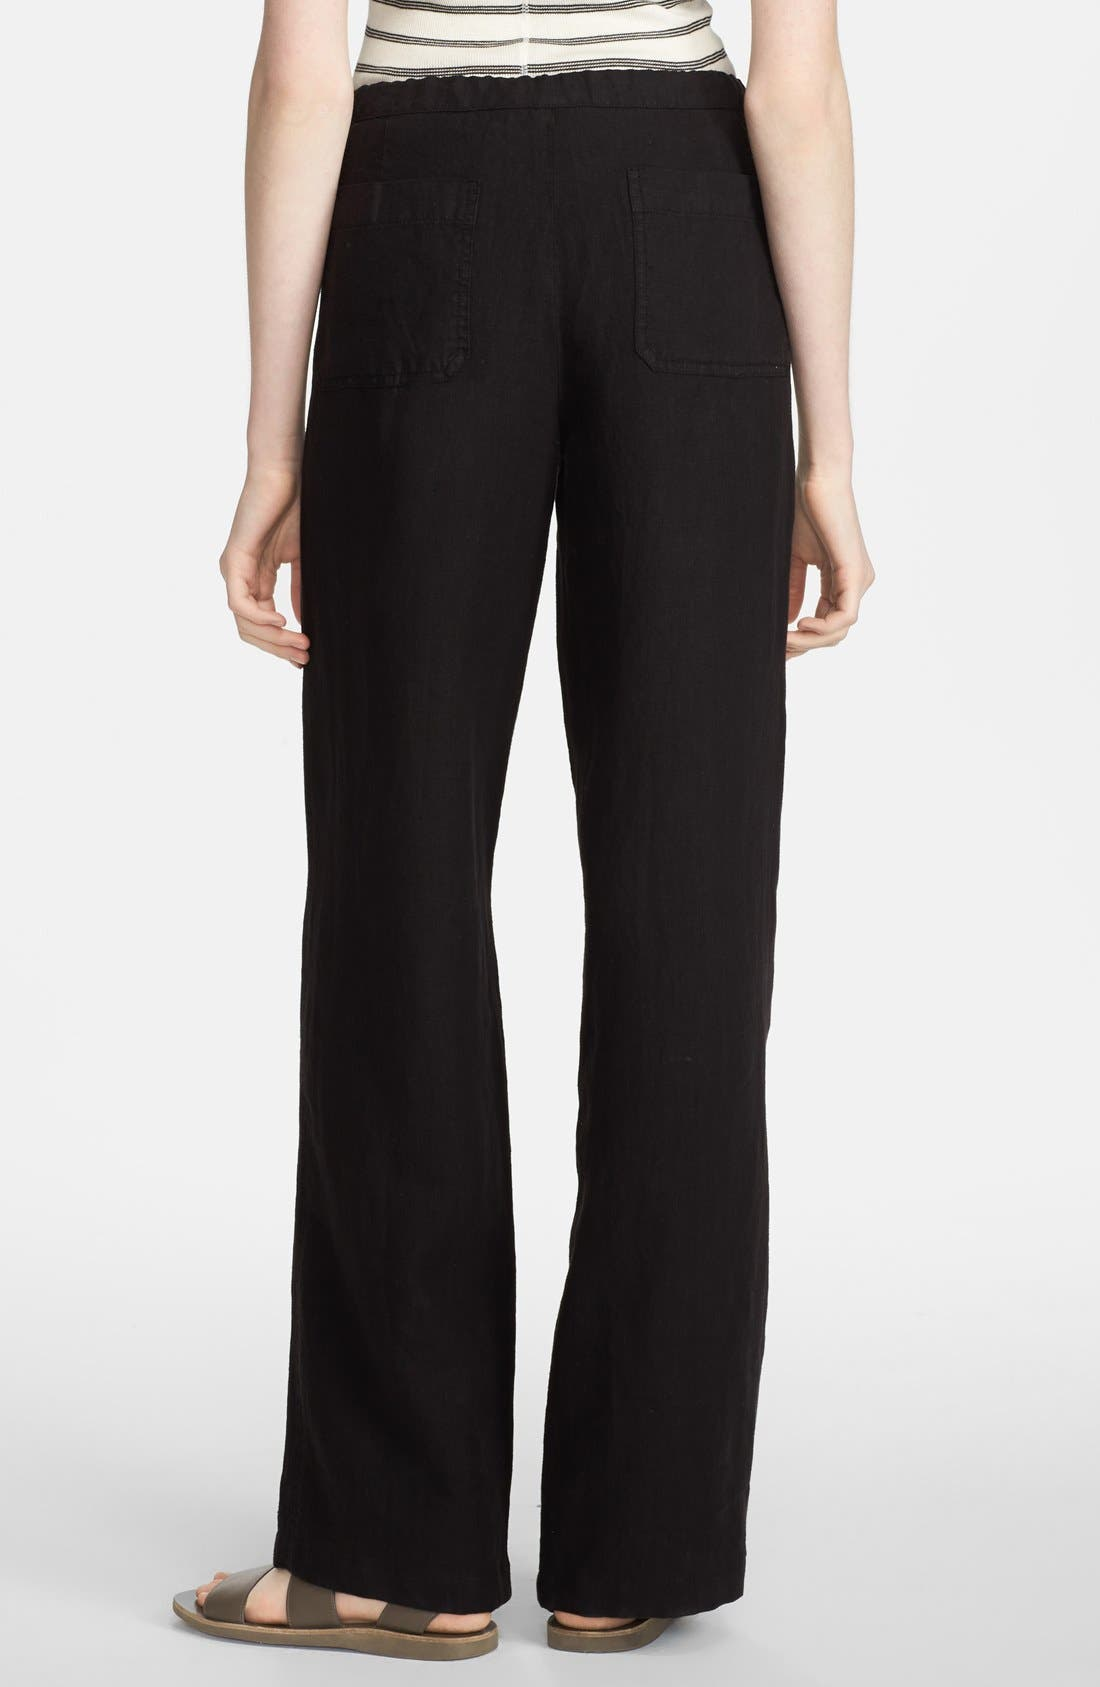 Alternate Image 3  - Vince 'Beach' Linen Pants